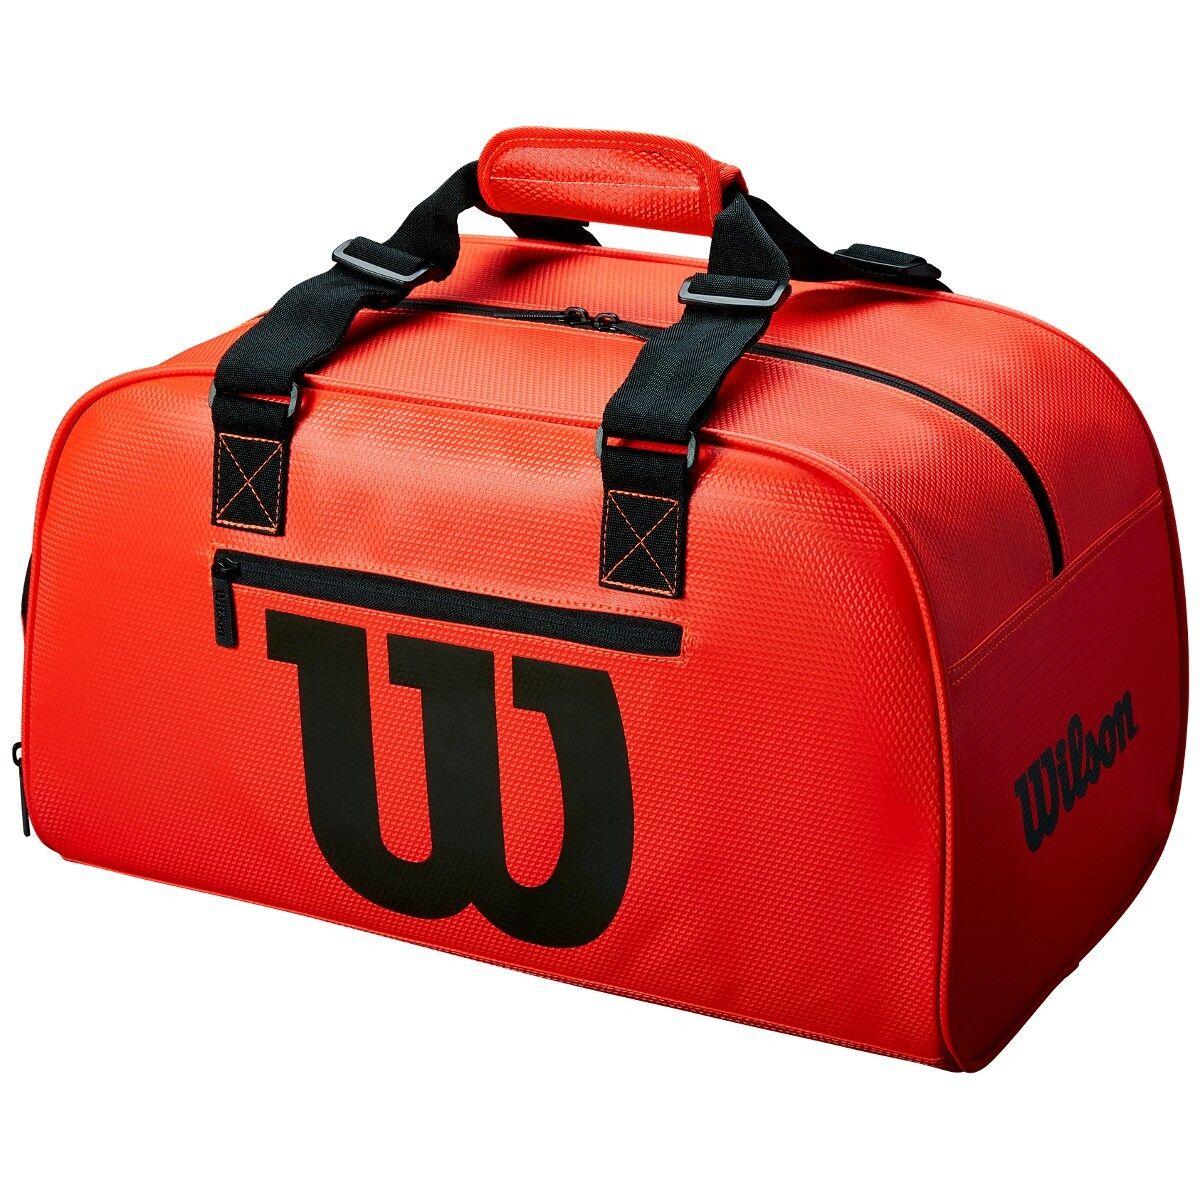 Wilson - WRZ847991 - Premium Infrared Duffle Tennis Bag Red